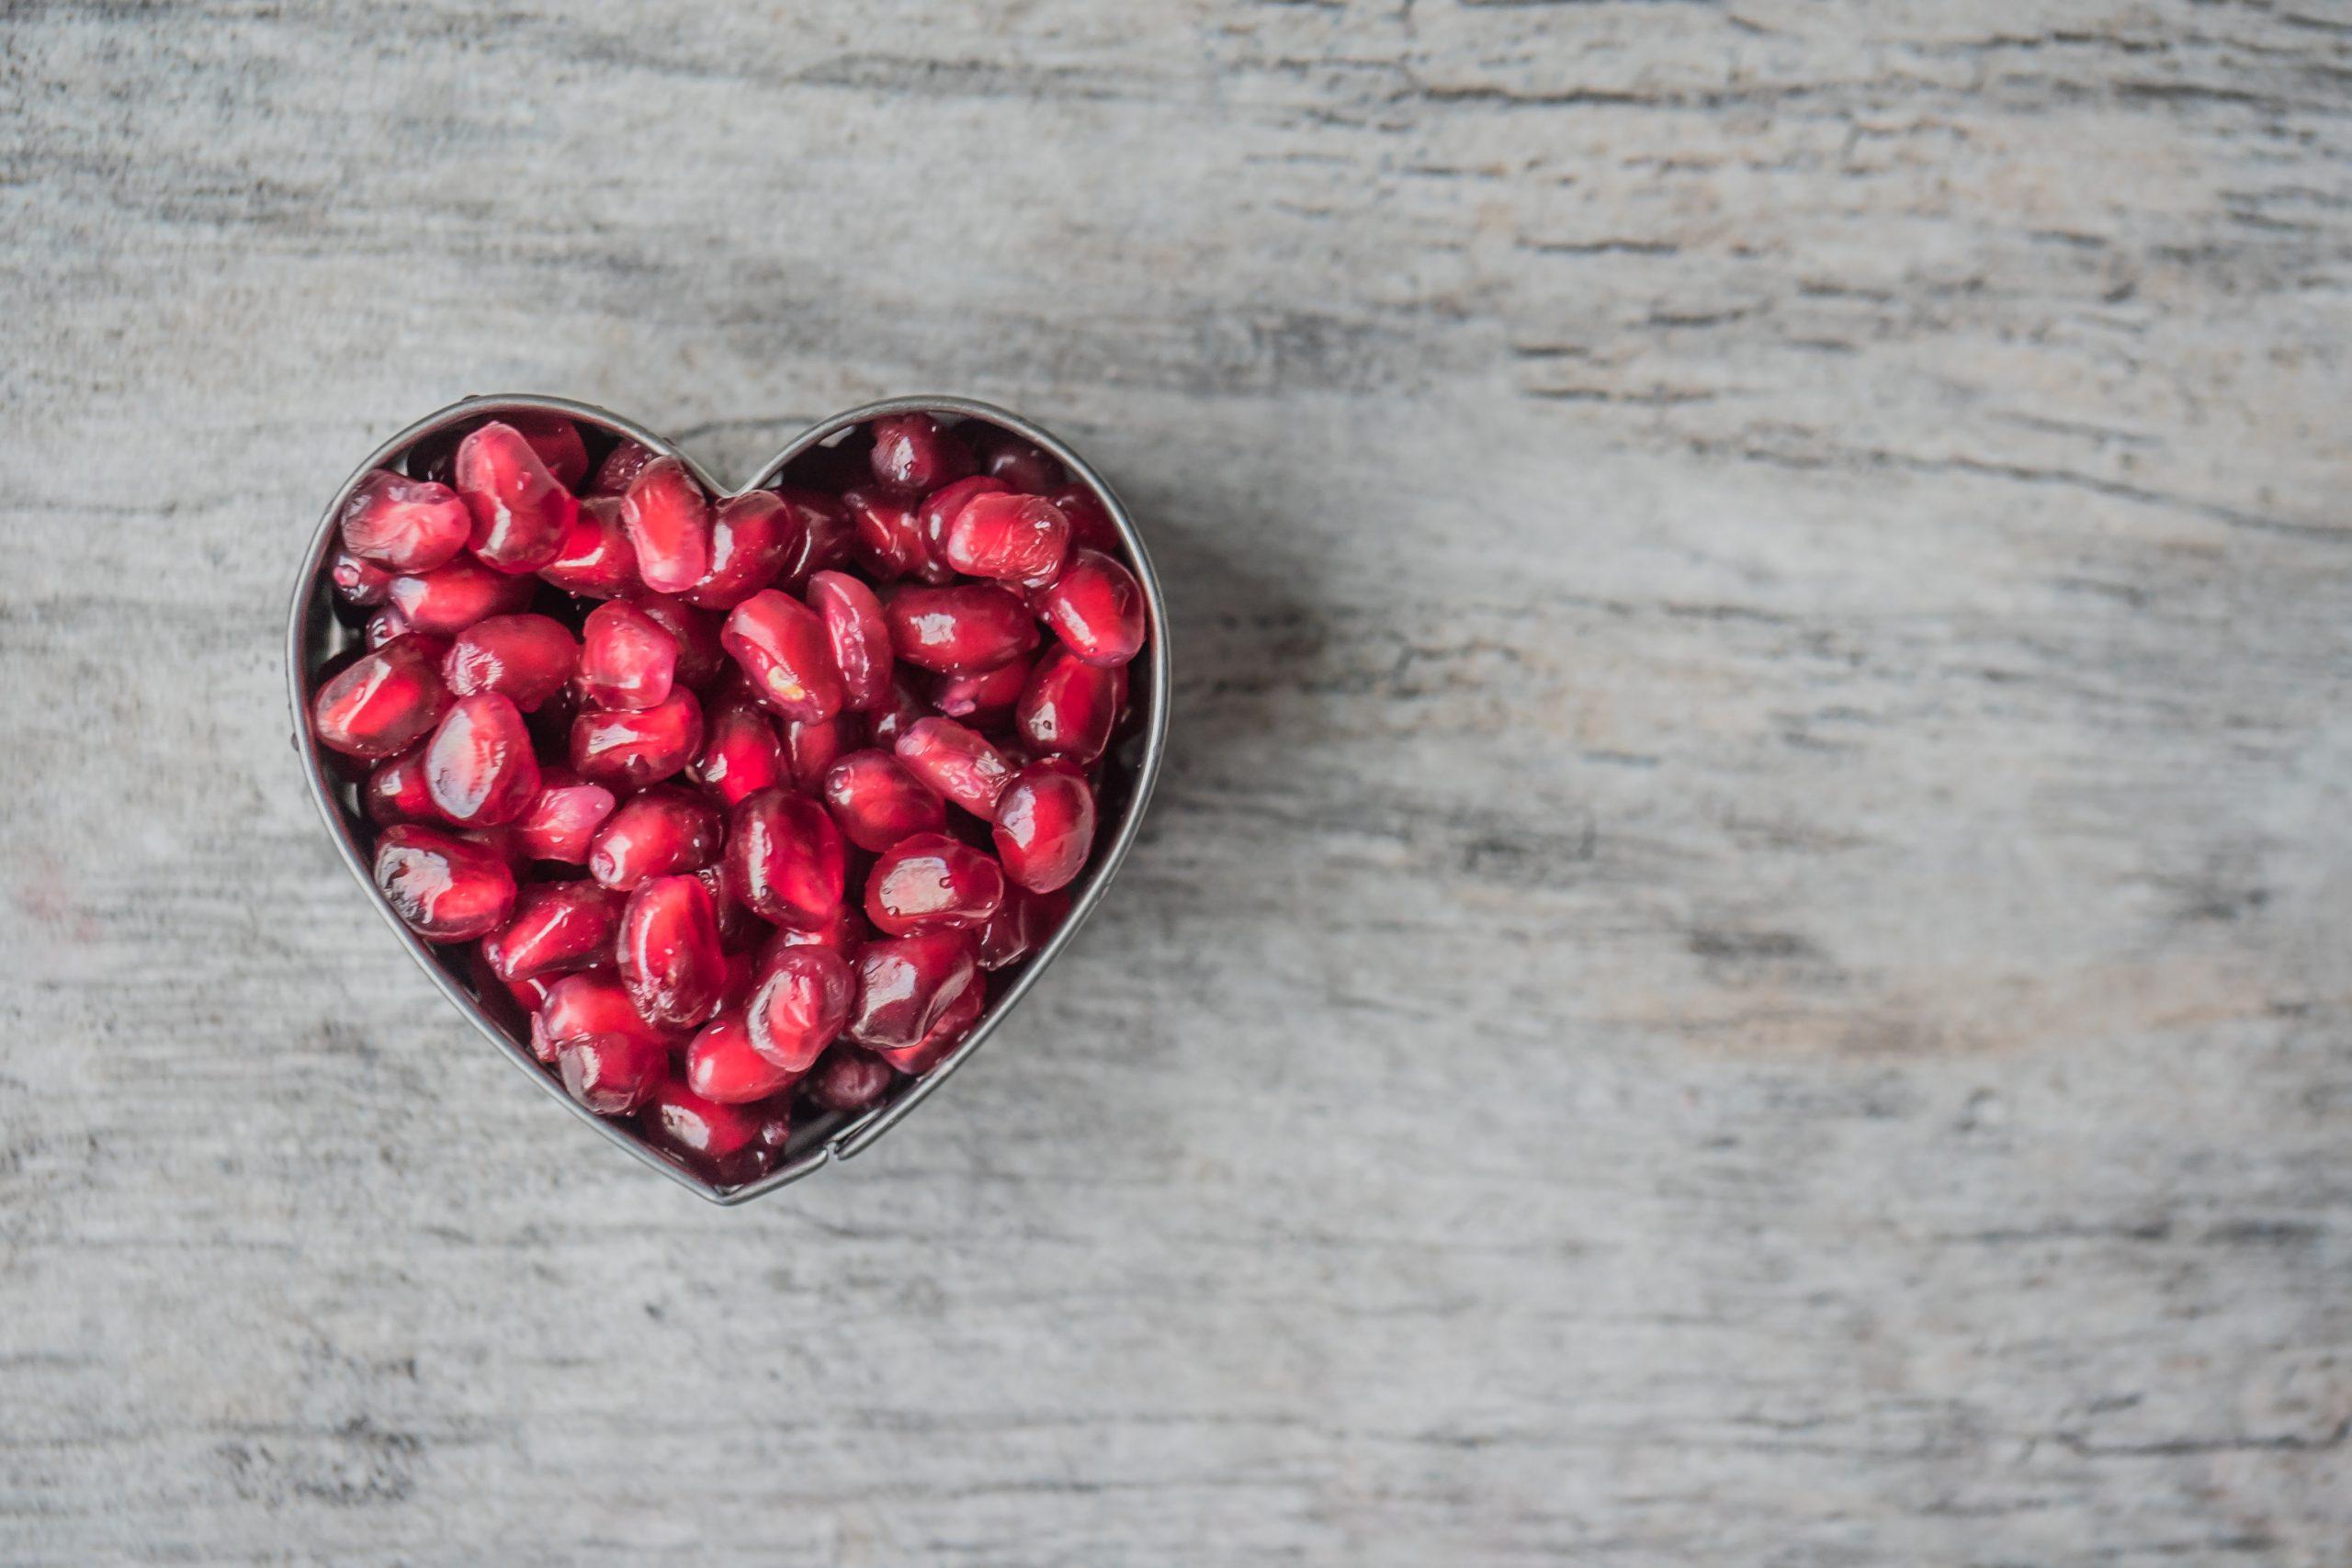 Terapia Nutricional Humanizada o que é?